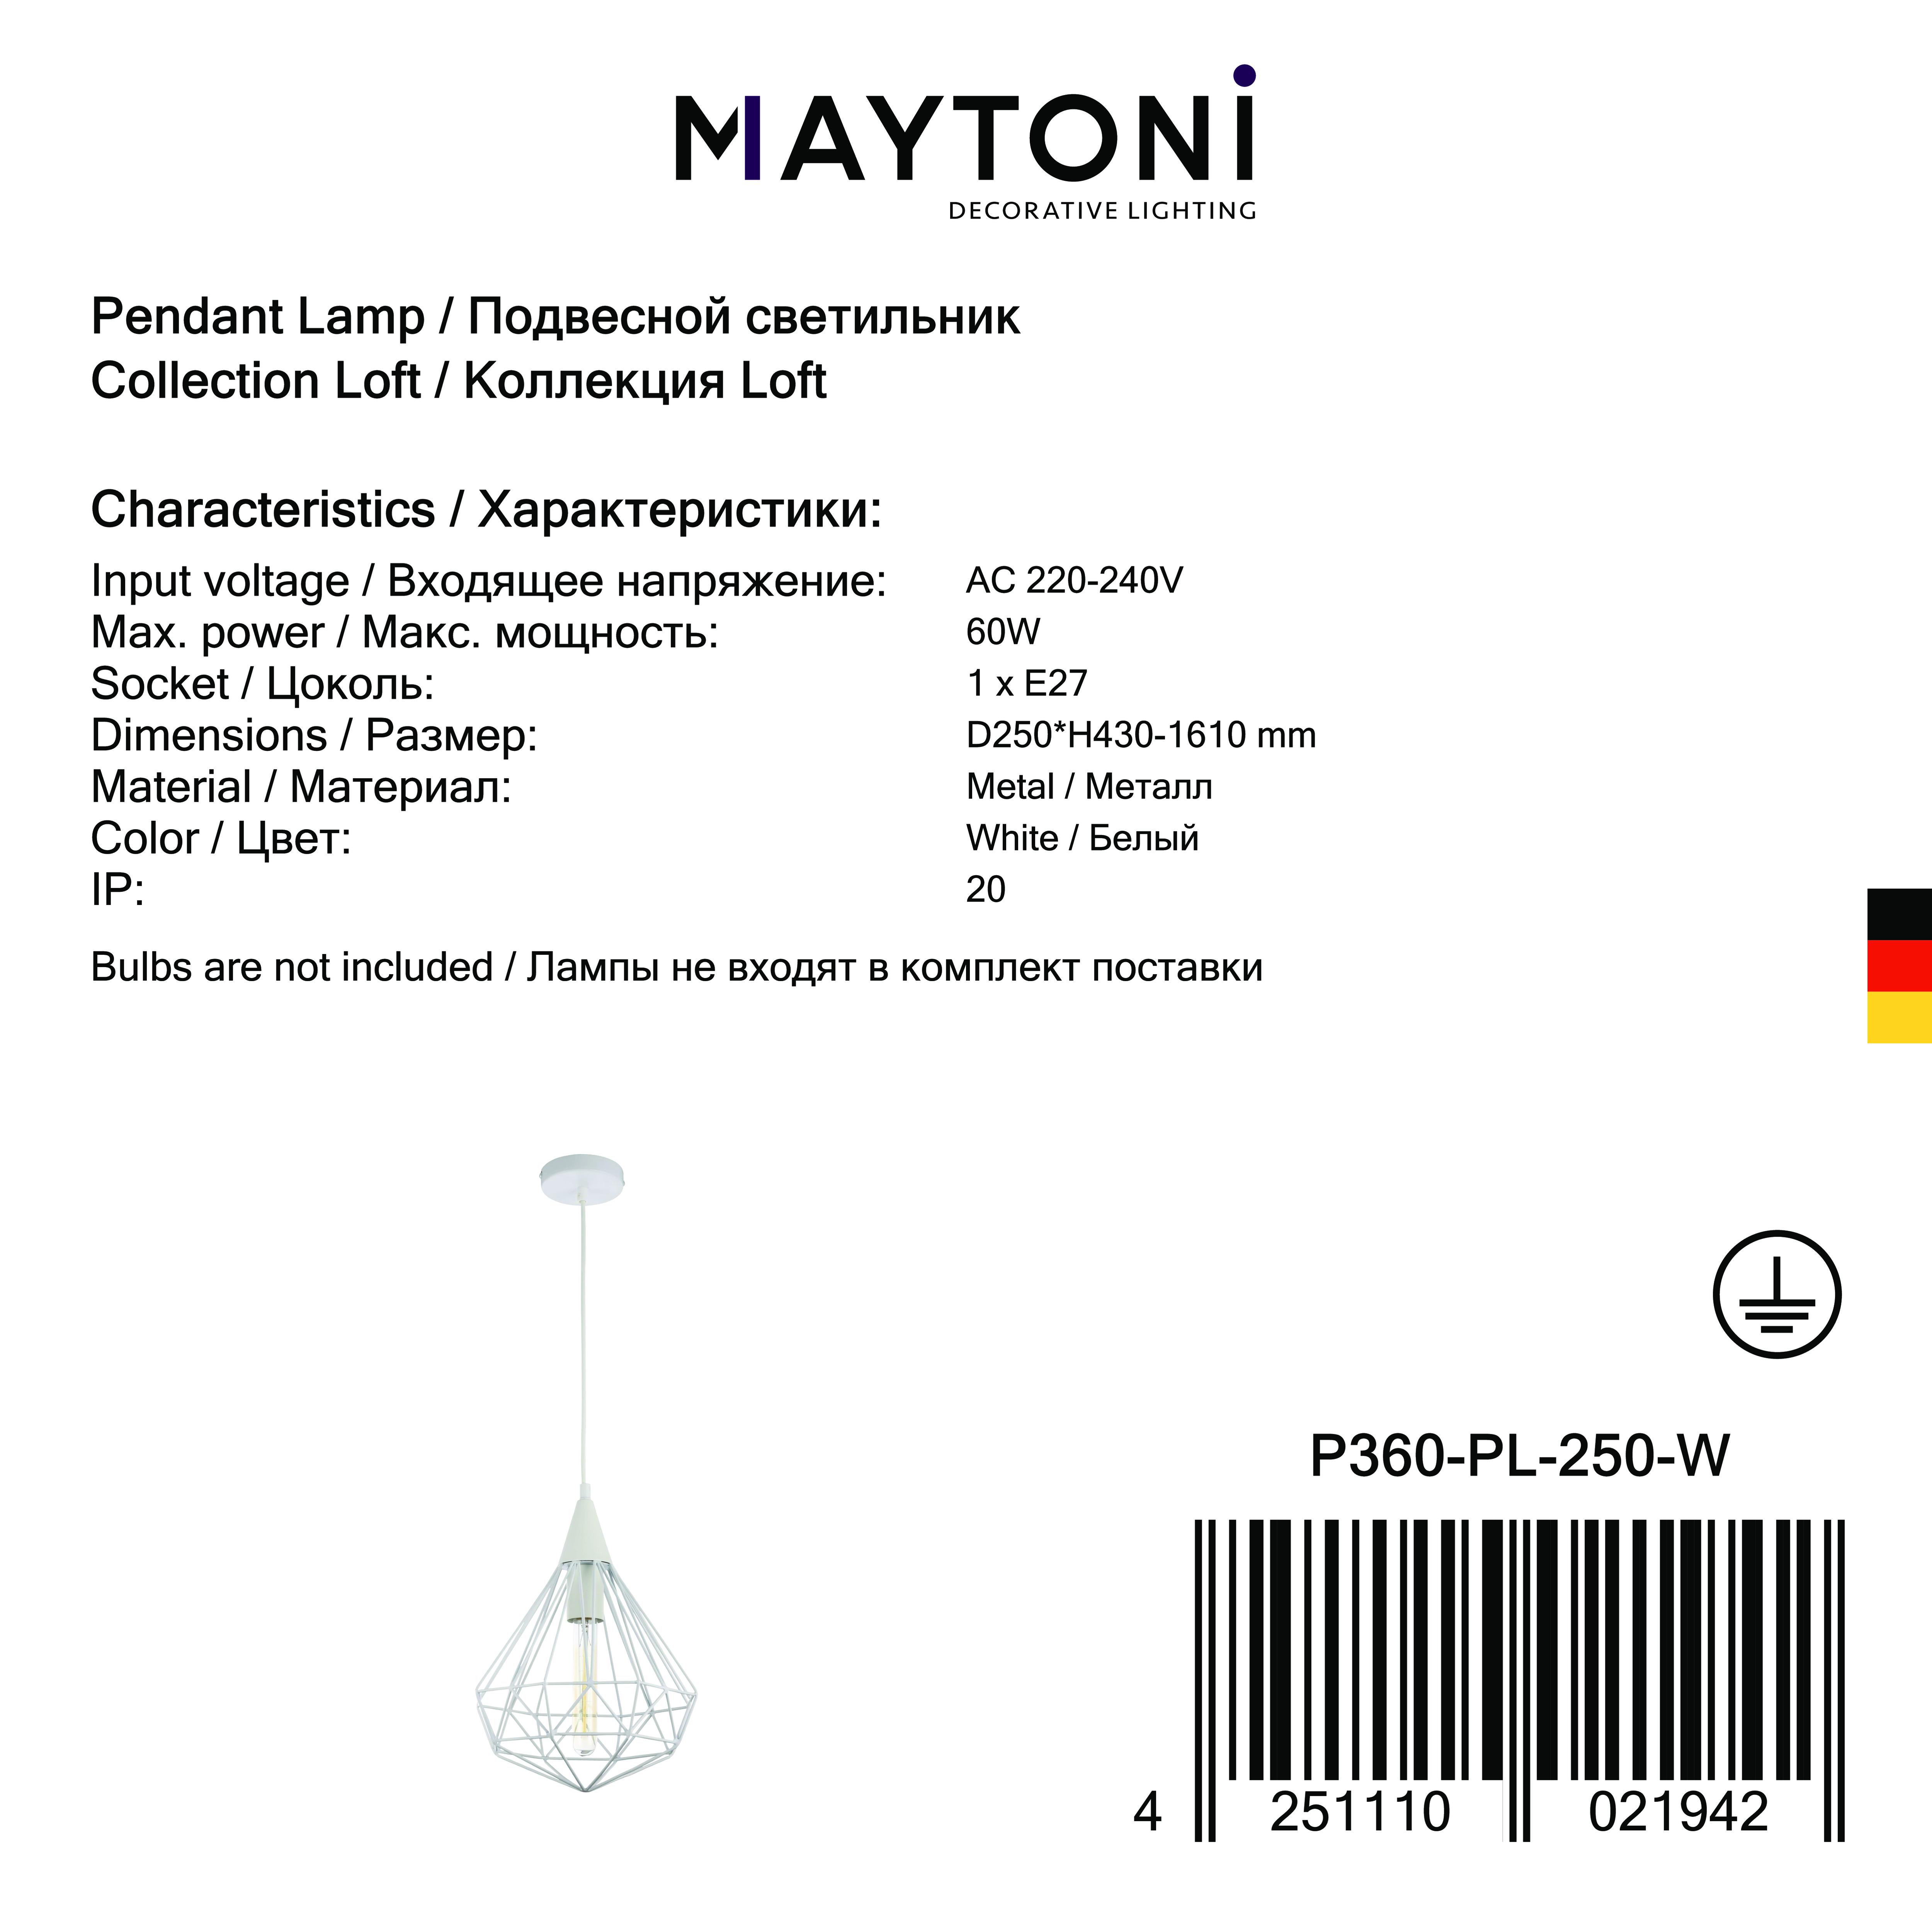 Подвесной светильник Maytoni Loft Calaf P360-PL-250-W (MOD360-01-W), 1xE27x60W, белый, металл - фото 8